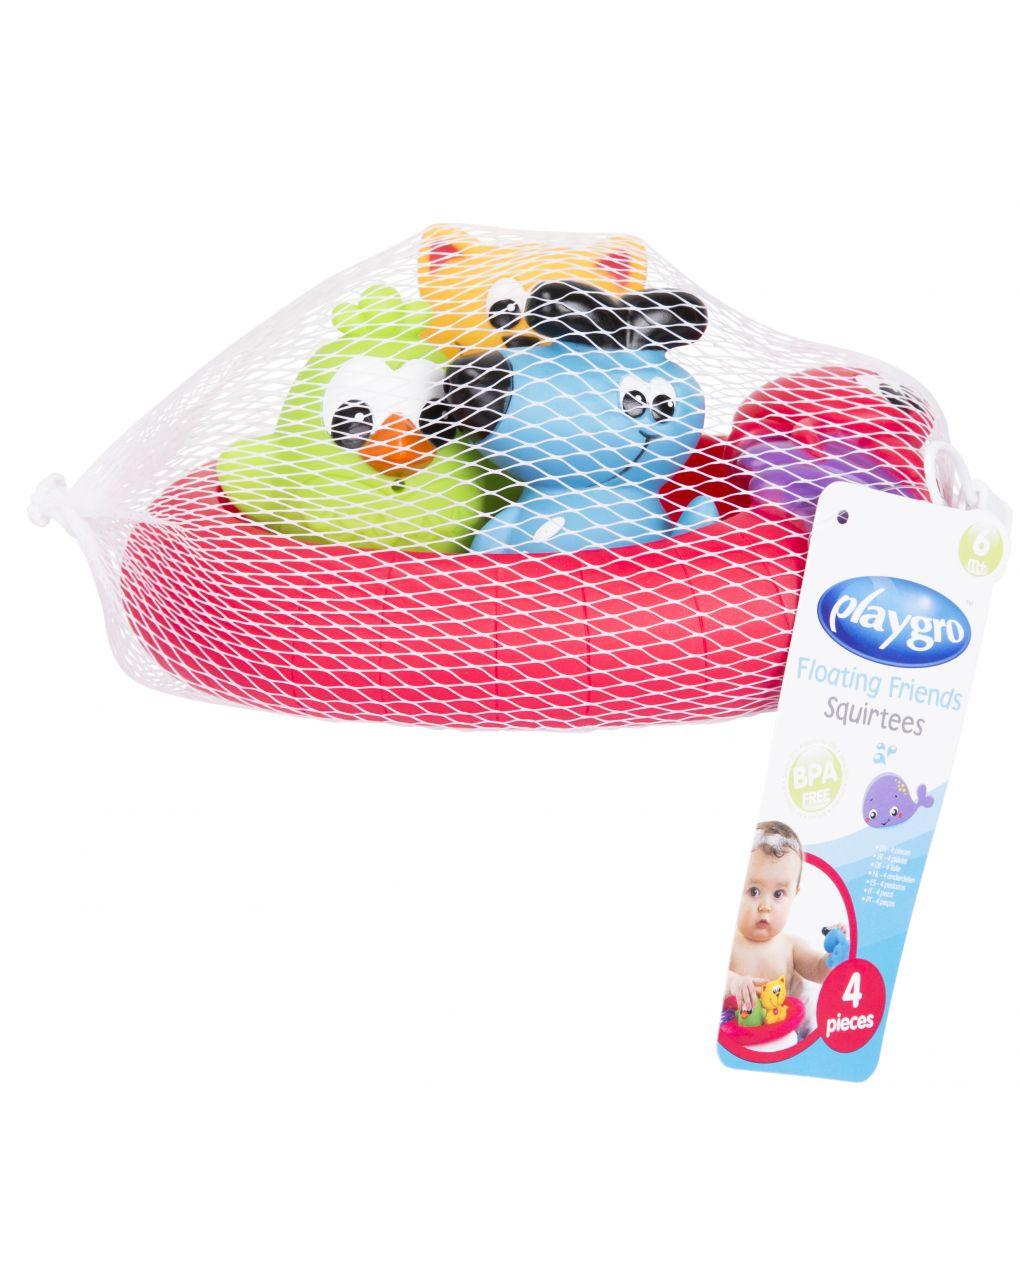 Playgro - splash and float friends - fully sealed - Playgro